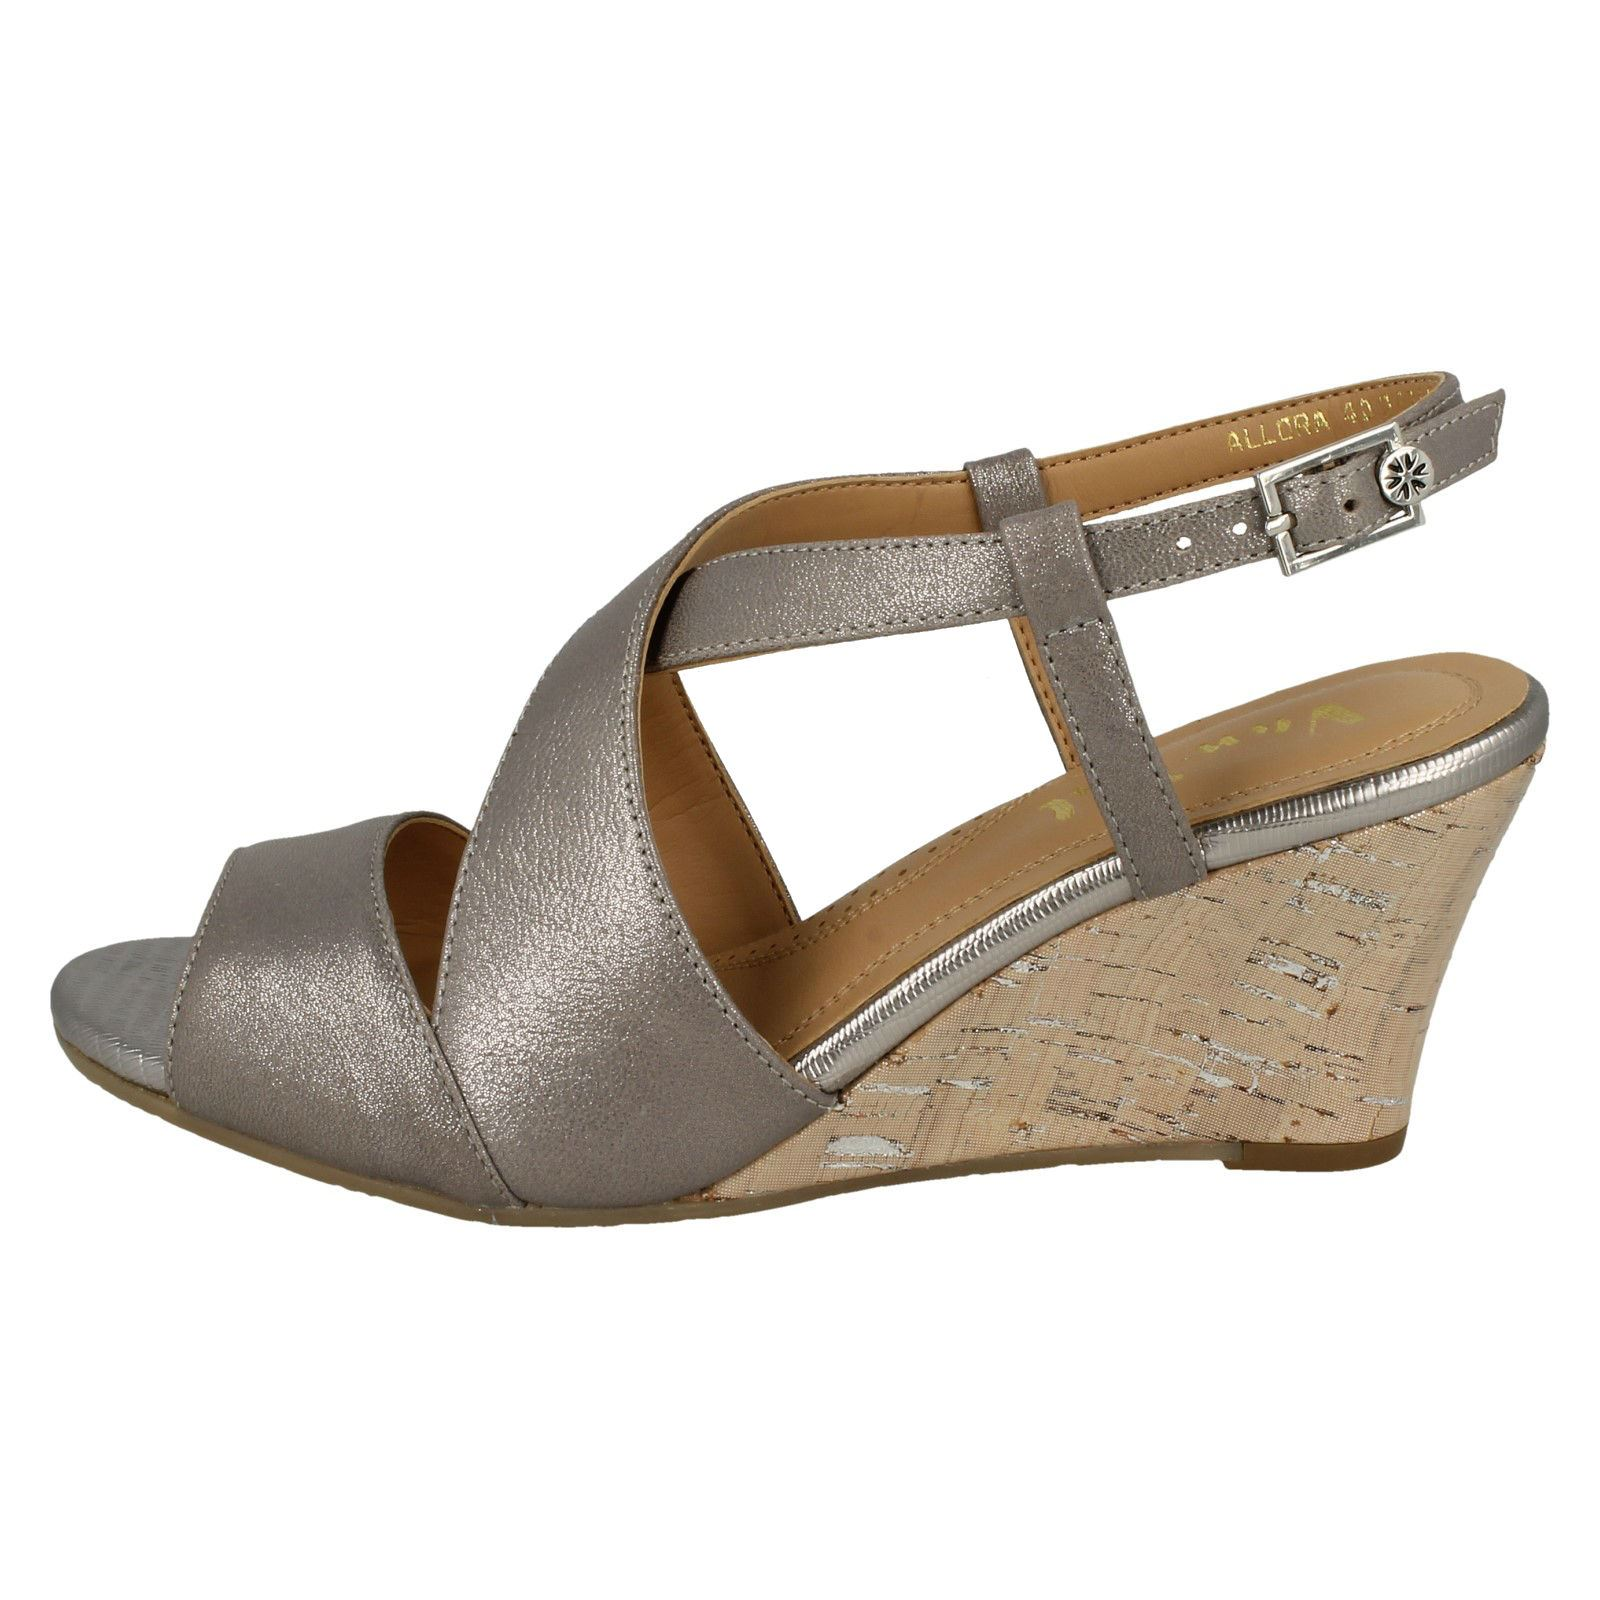 Ladies-Van-Dal-Cross-Strap-Wedged-Sandal-Allora thumbnail 28